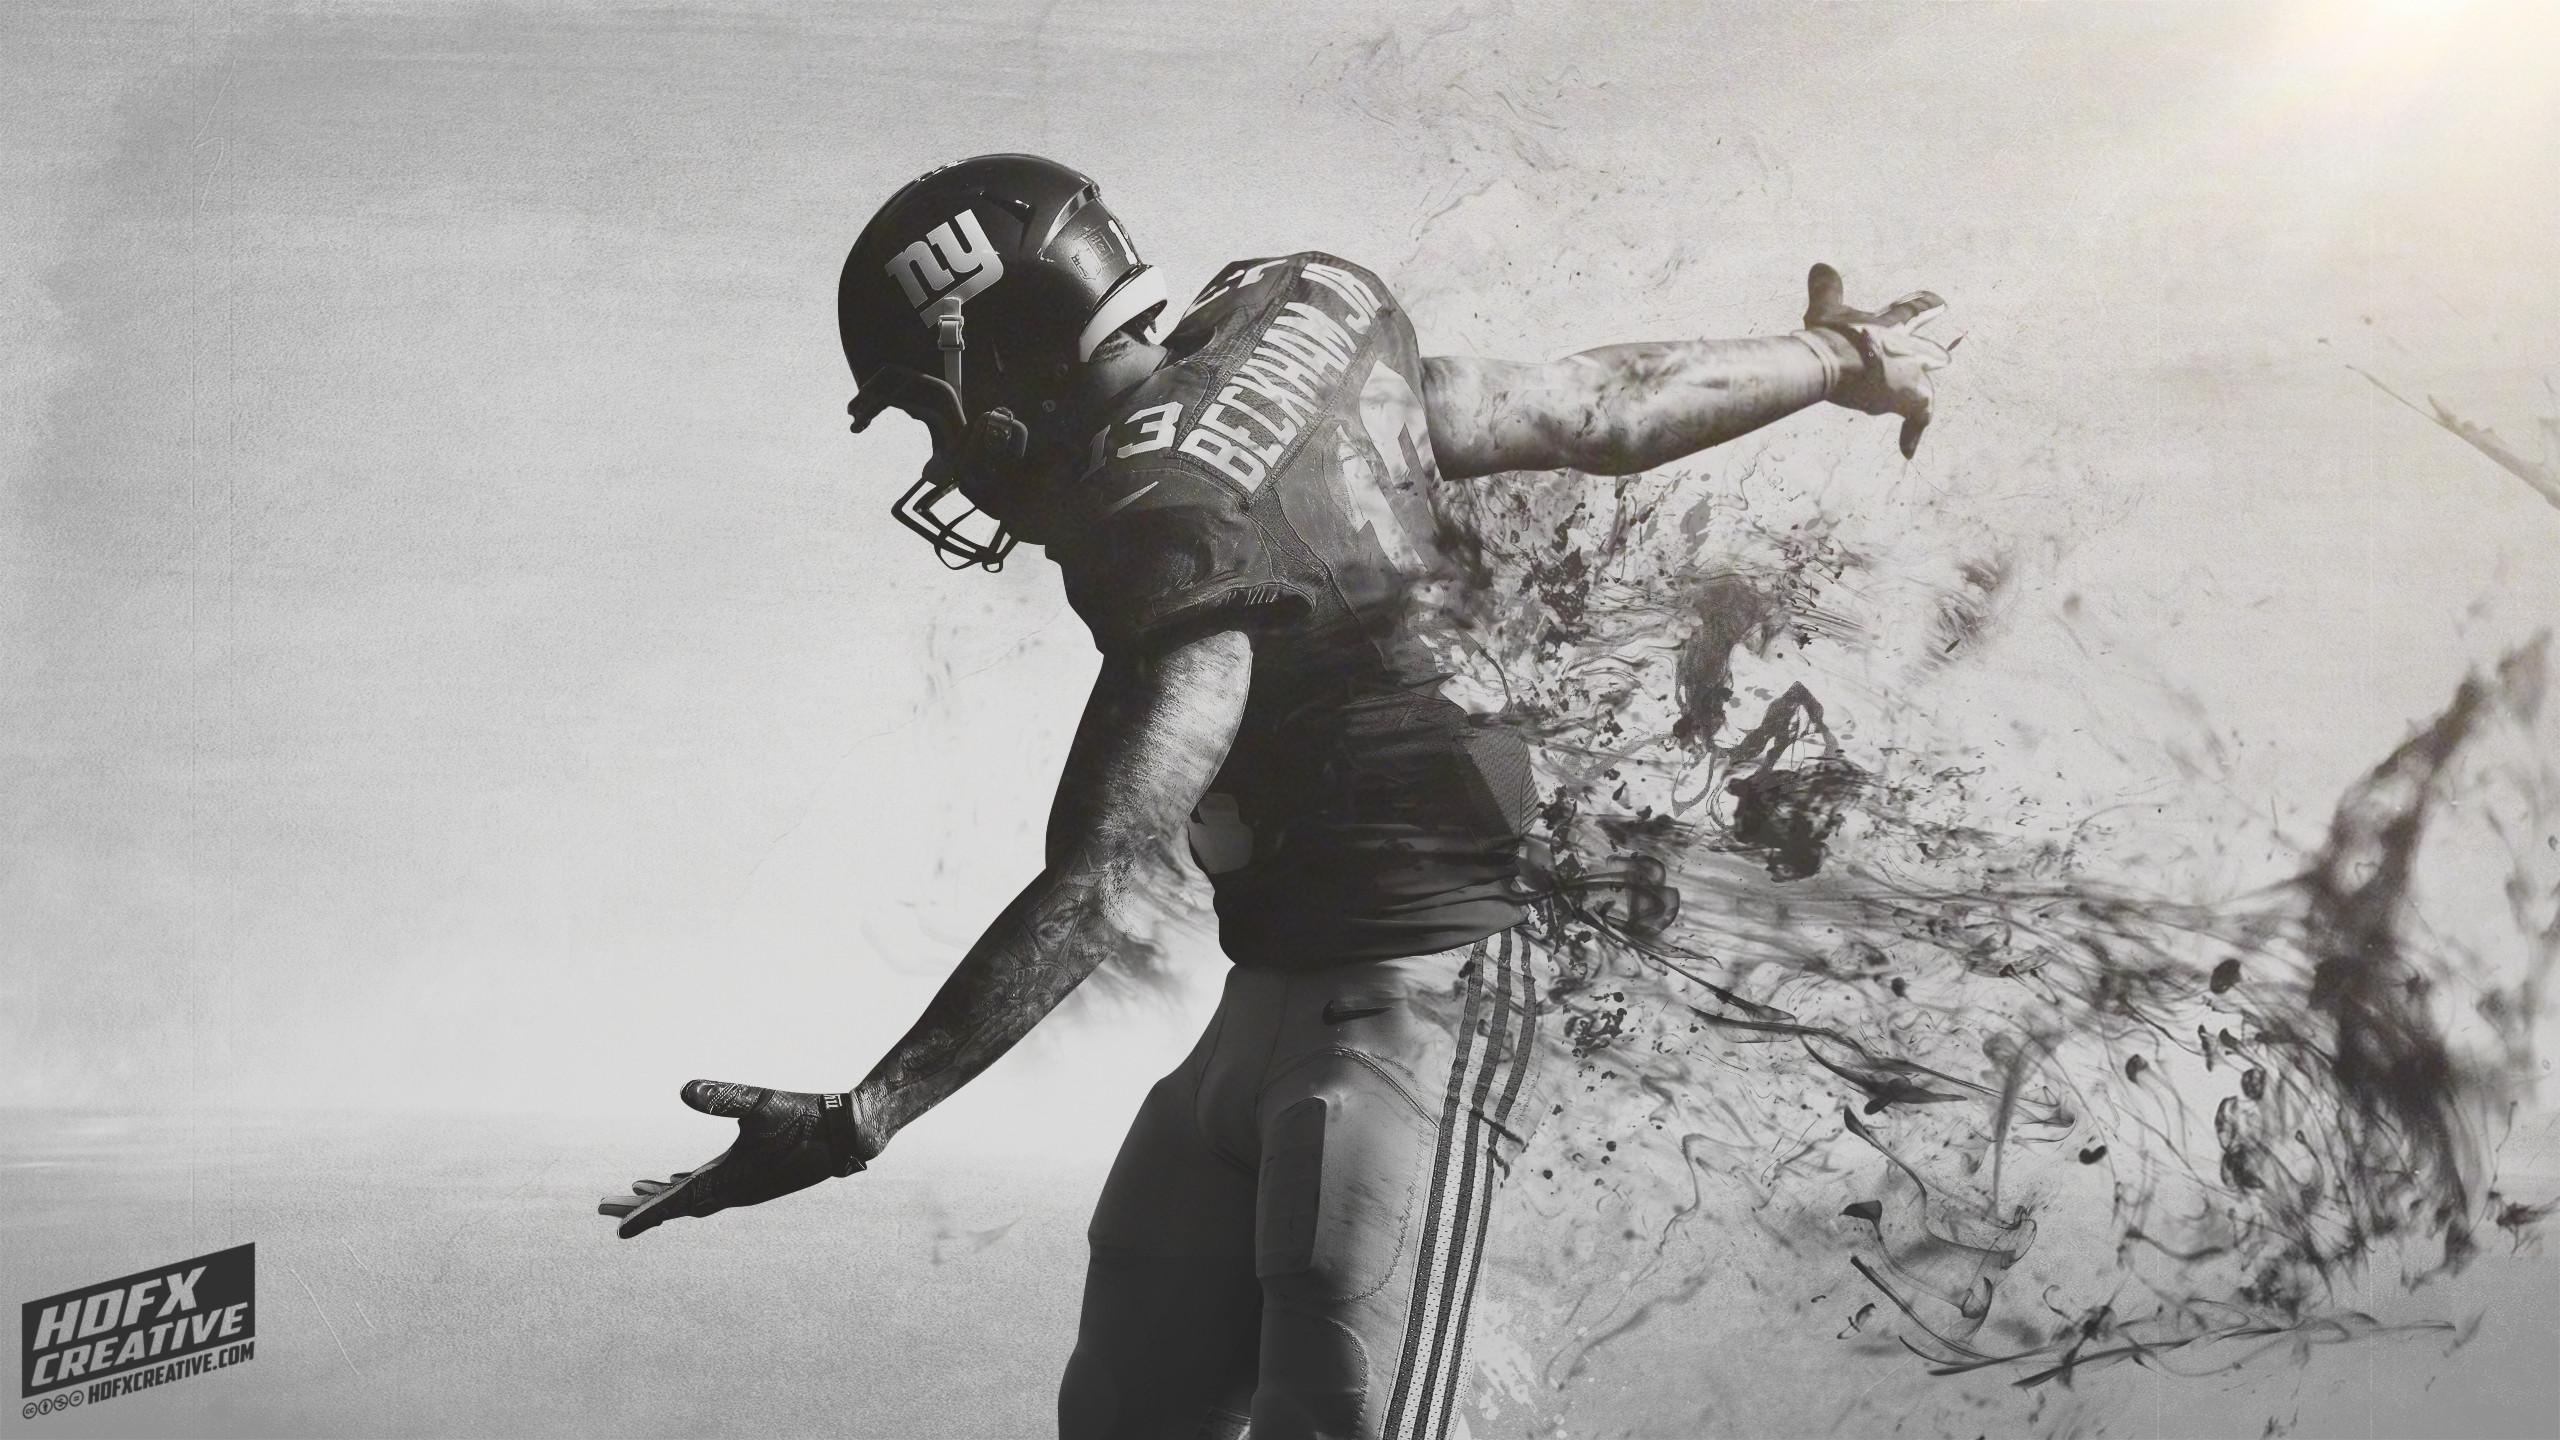 NFL Wallpapers | HDFX CREATIVE